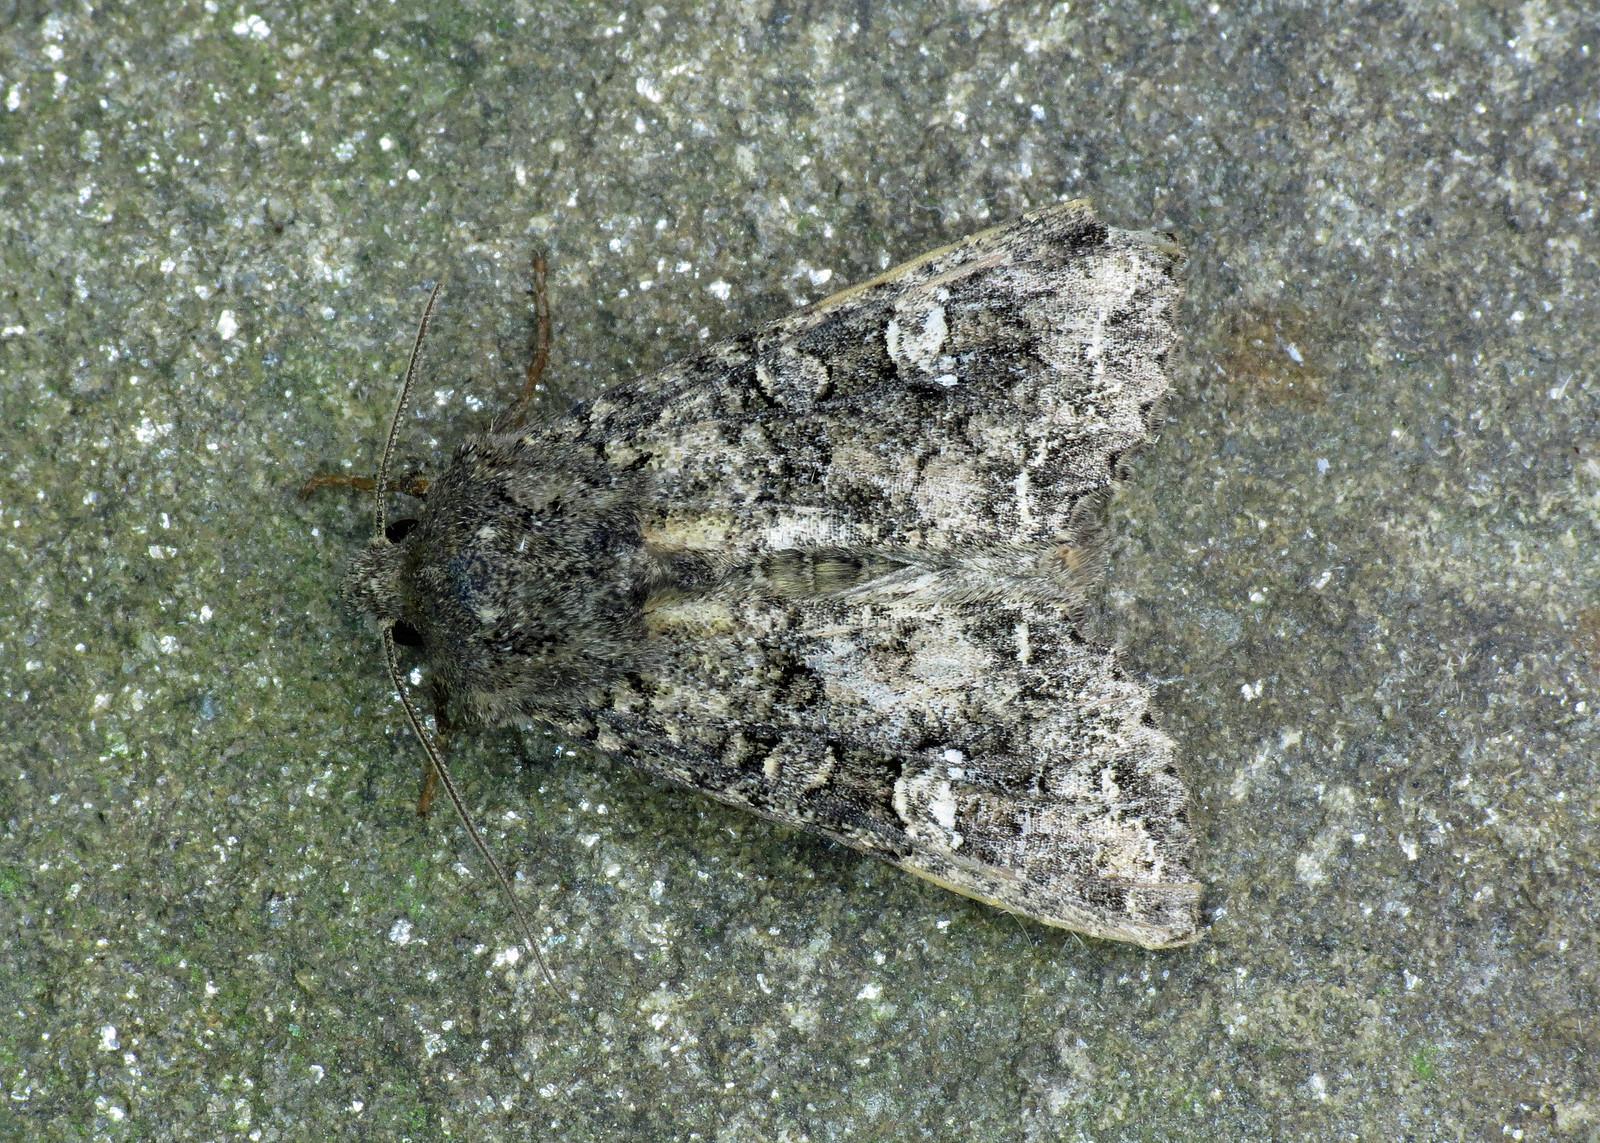 2154 Cabbage Moth - Mamestra brassicae